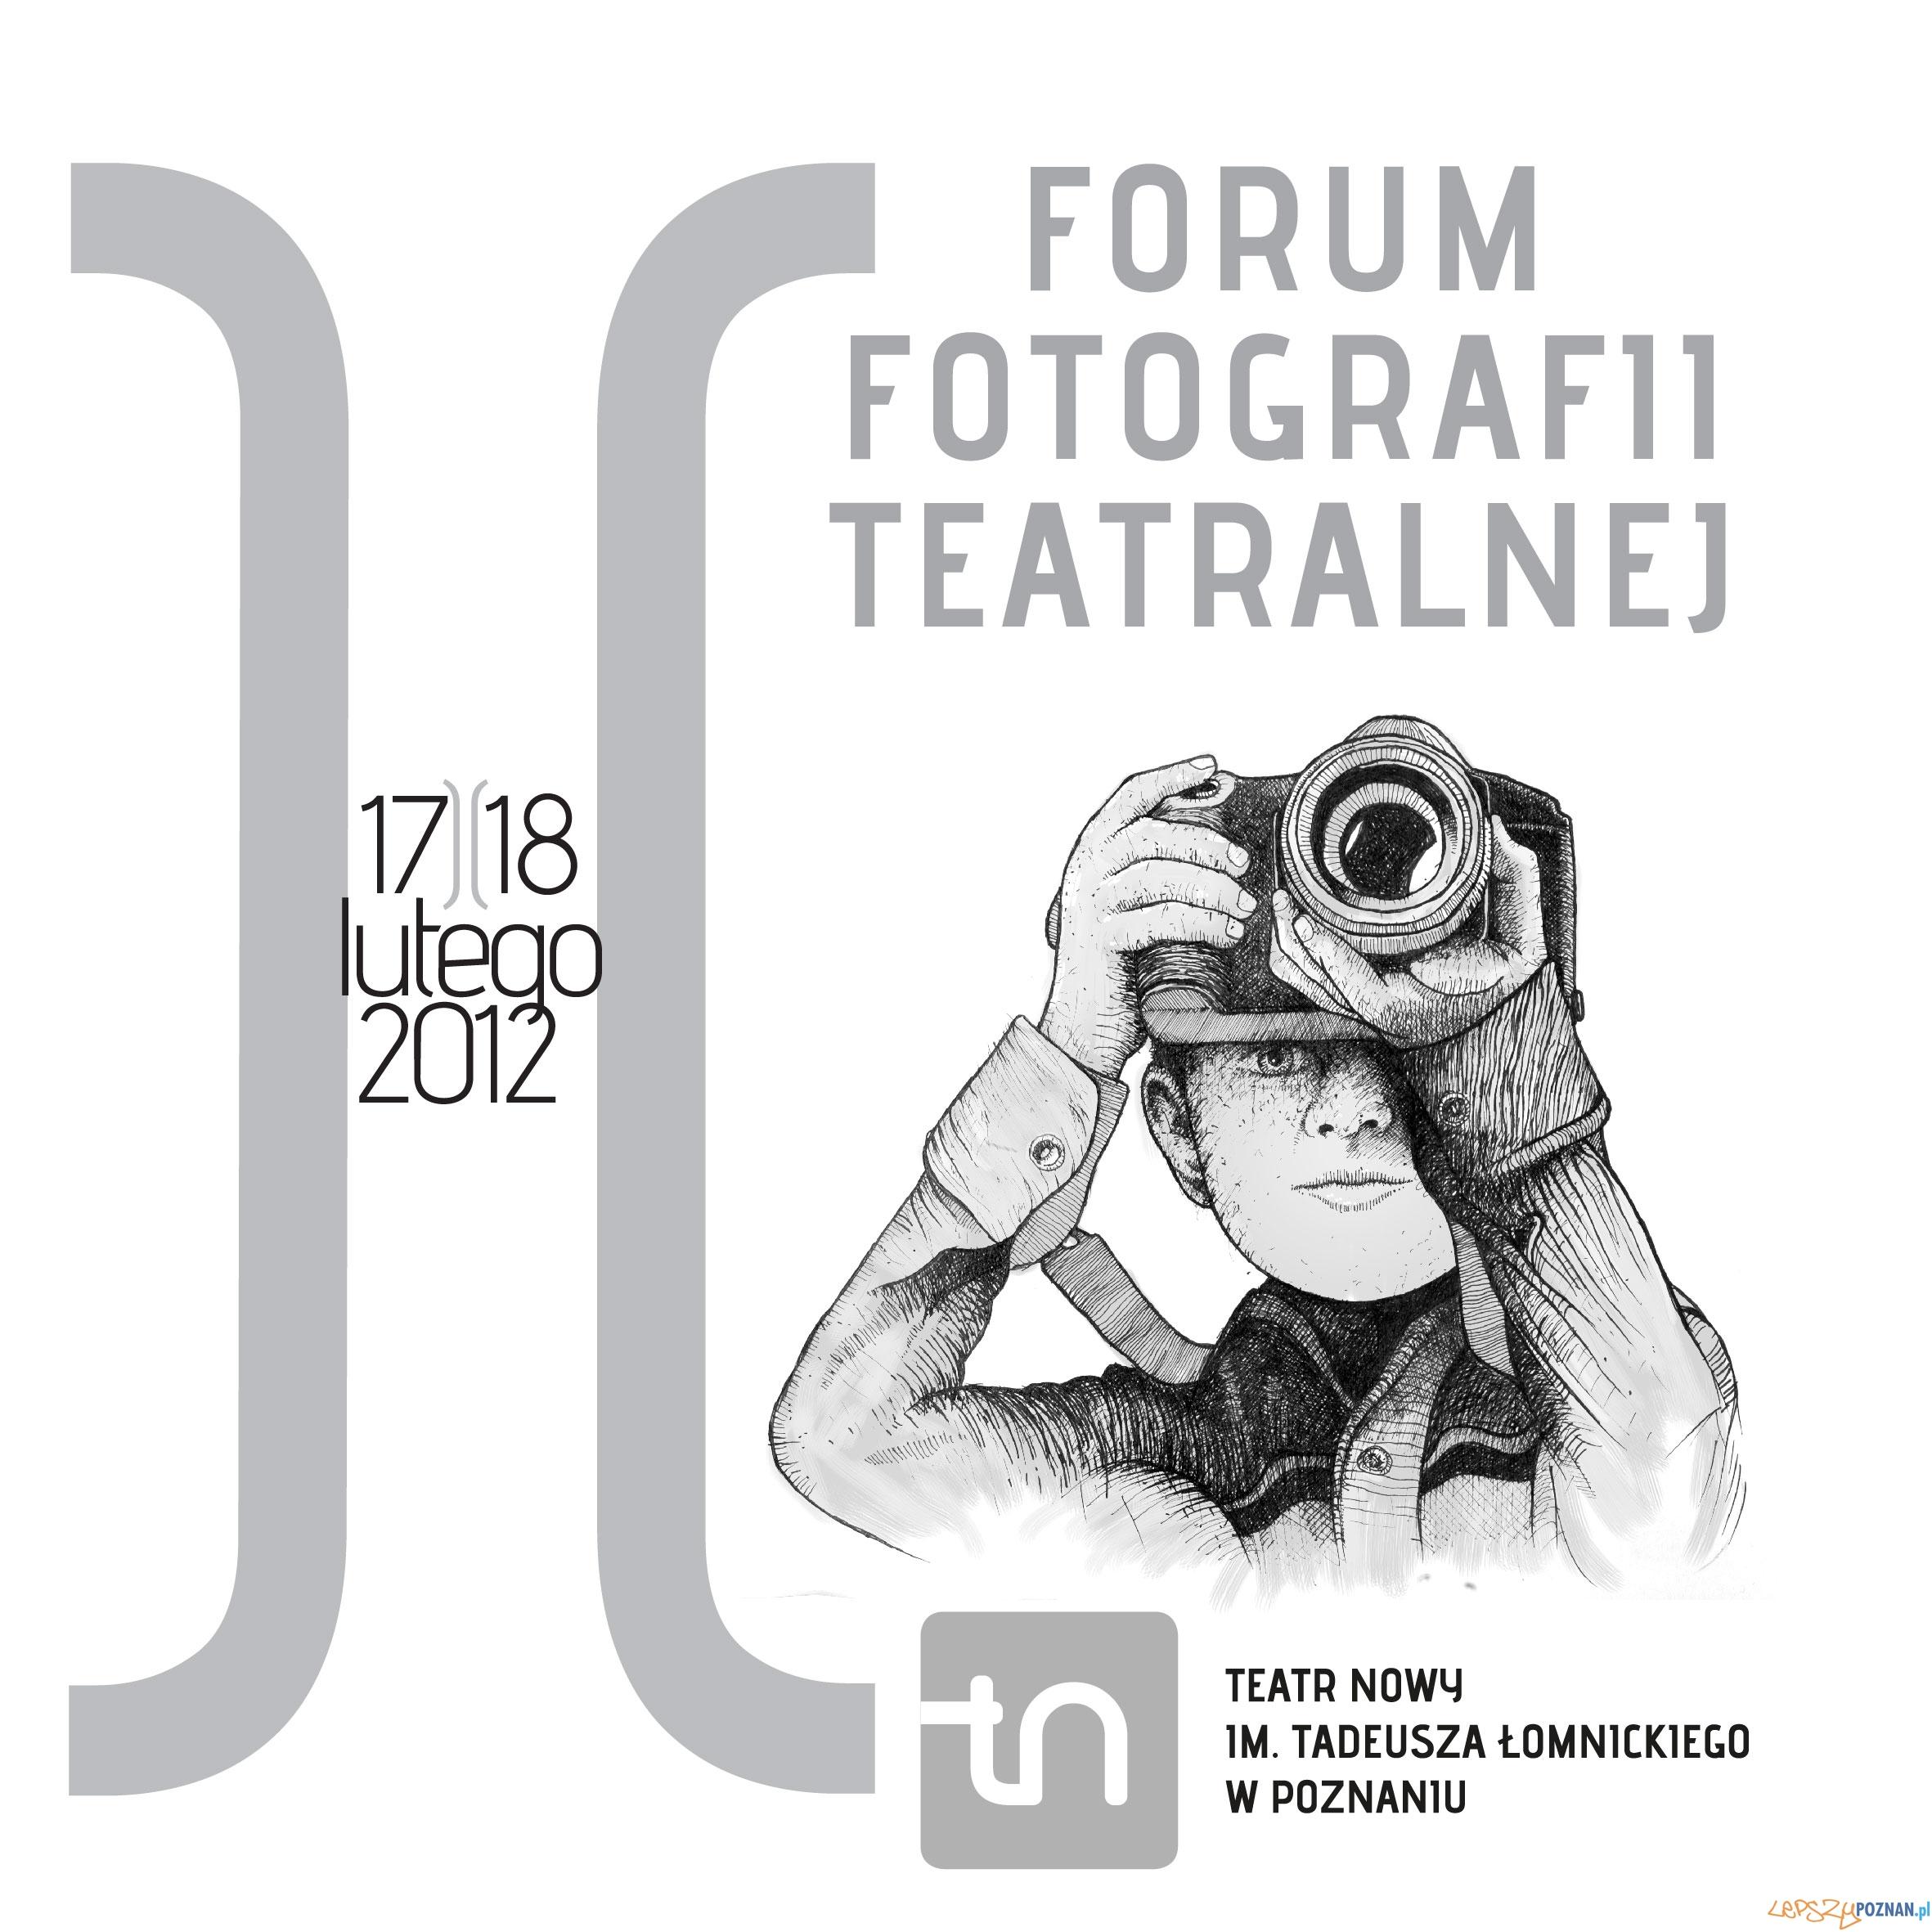 Forum Fotografii Teatralnej  Foto: Forum Fotografii Teatralnej